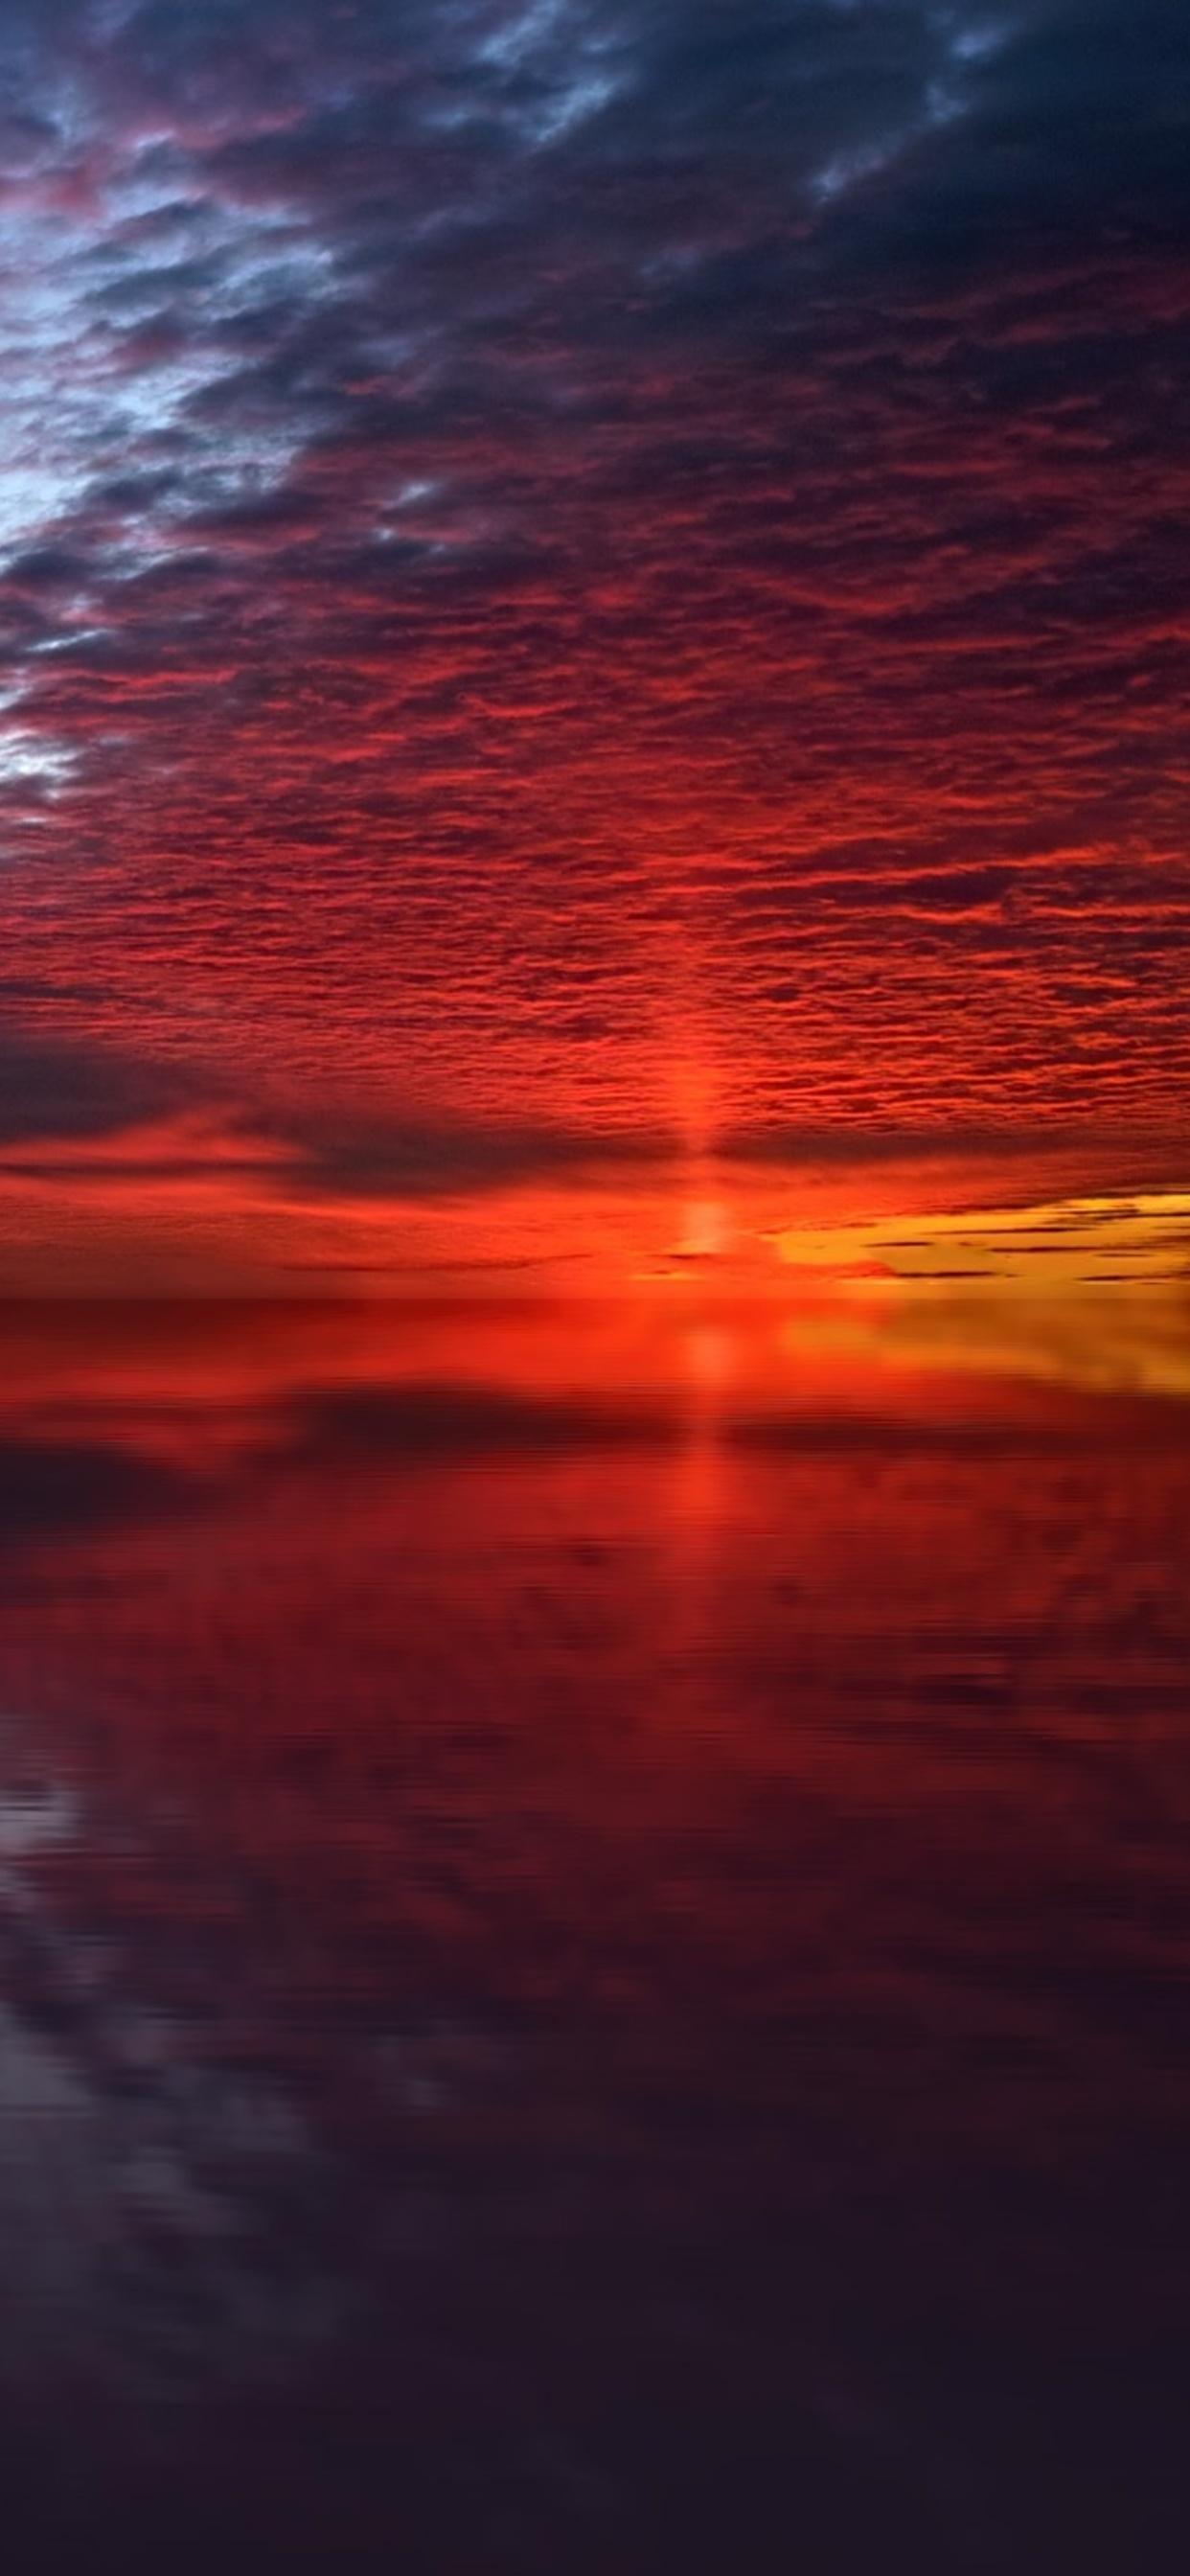 twilight-sea-stars-dusk-dawn-dark-sunset-82.jpg